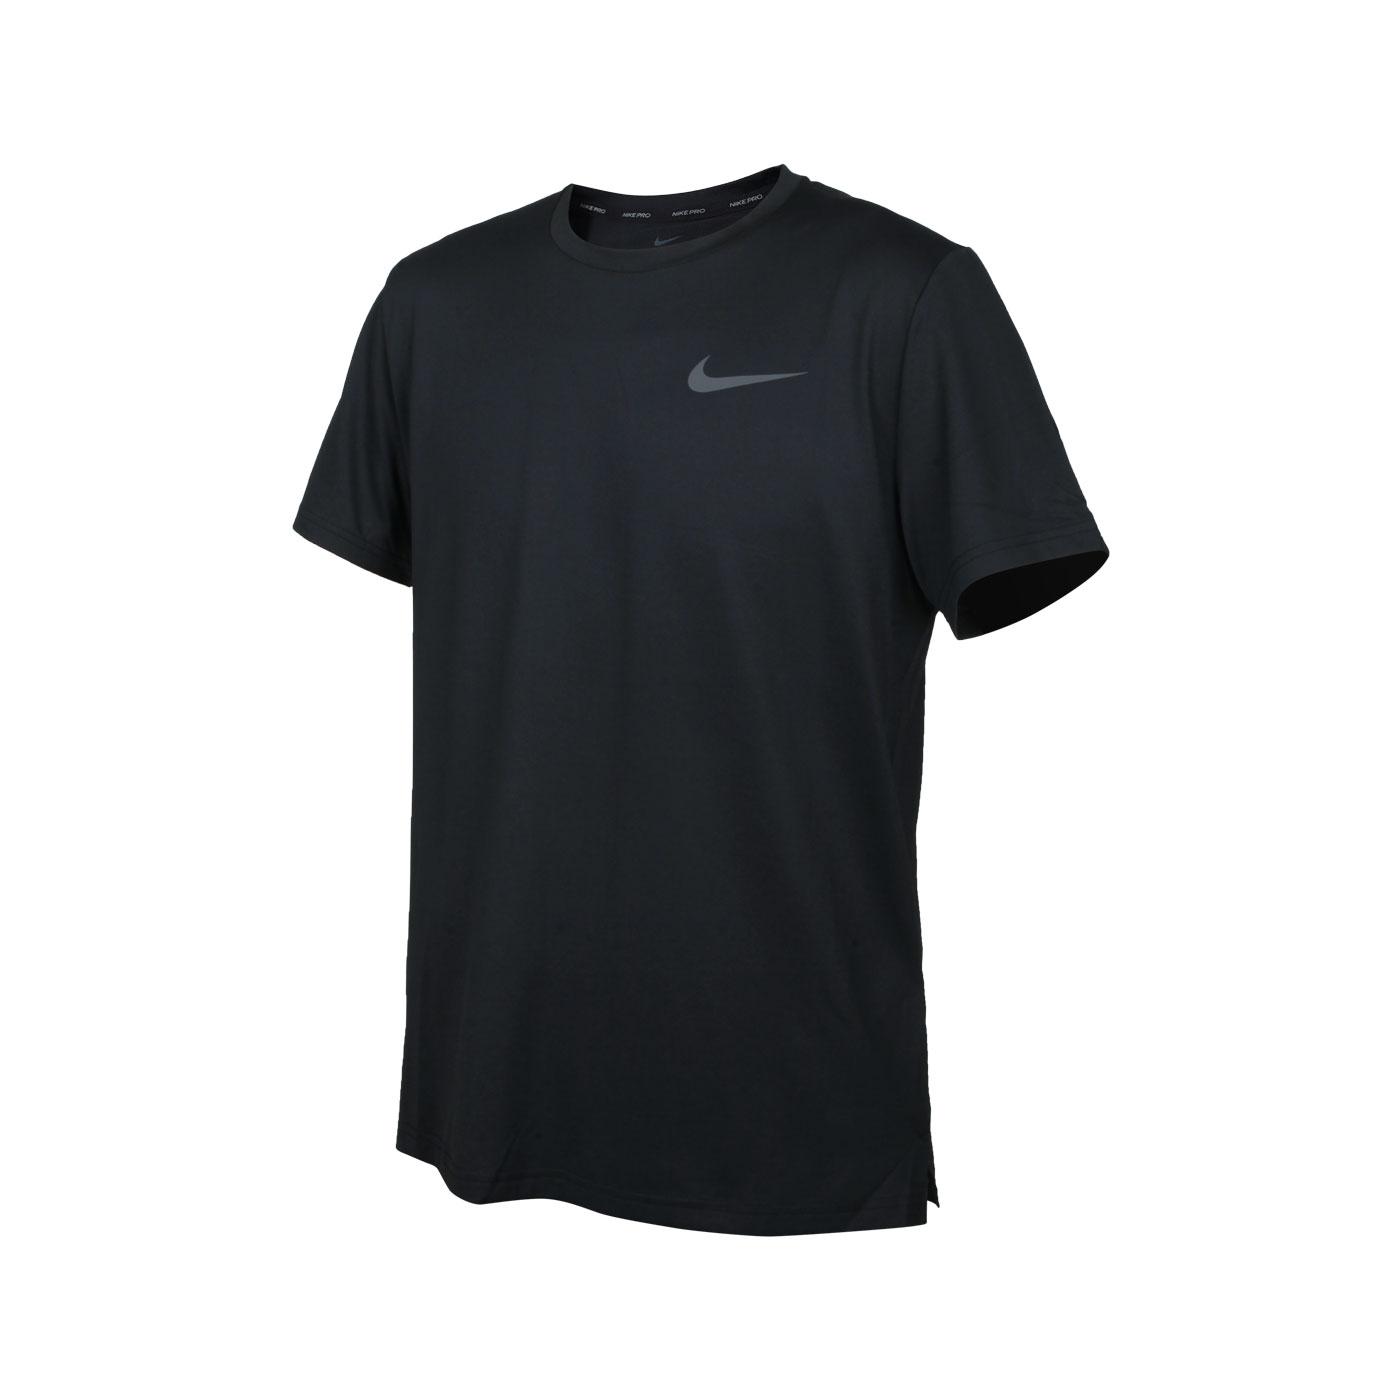 NIKE 男款短袖T恤 CZ1182-011